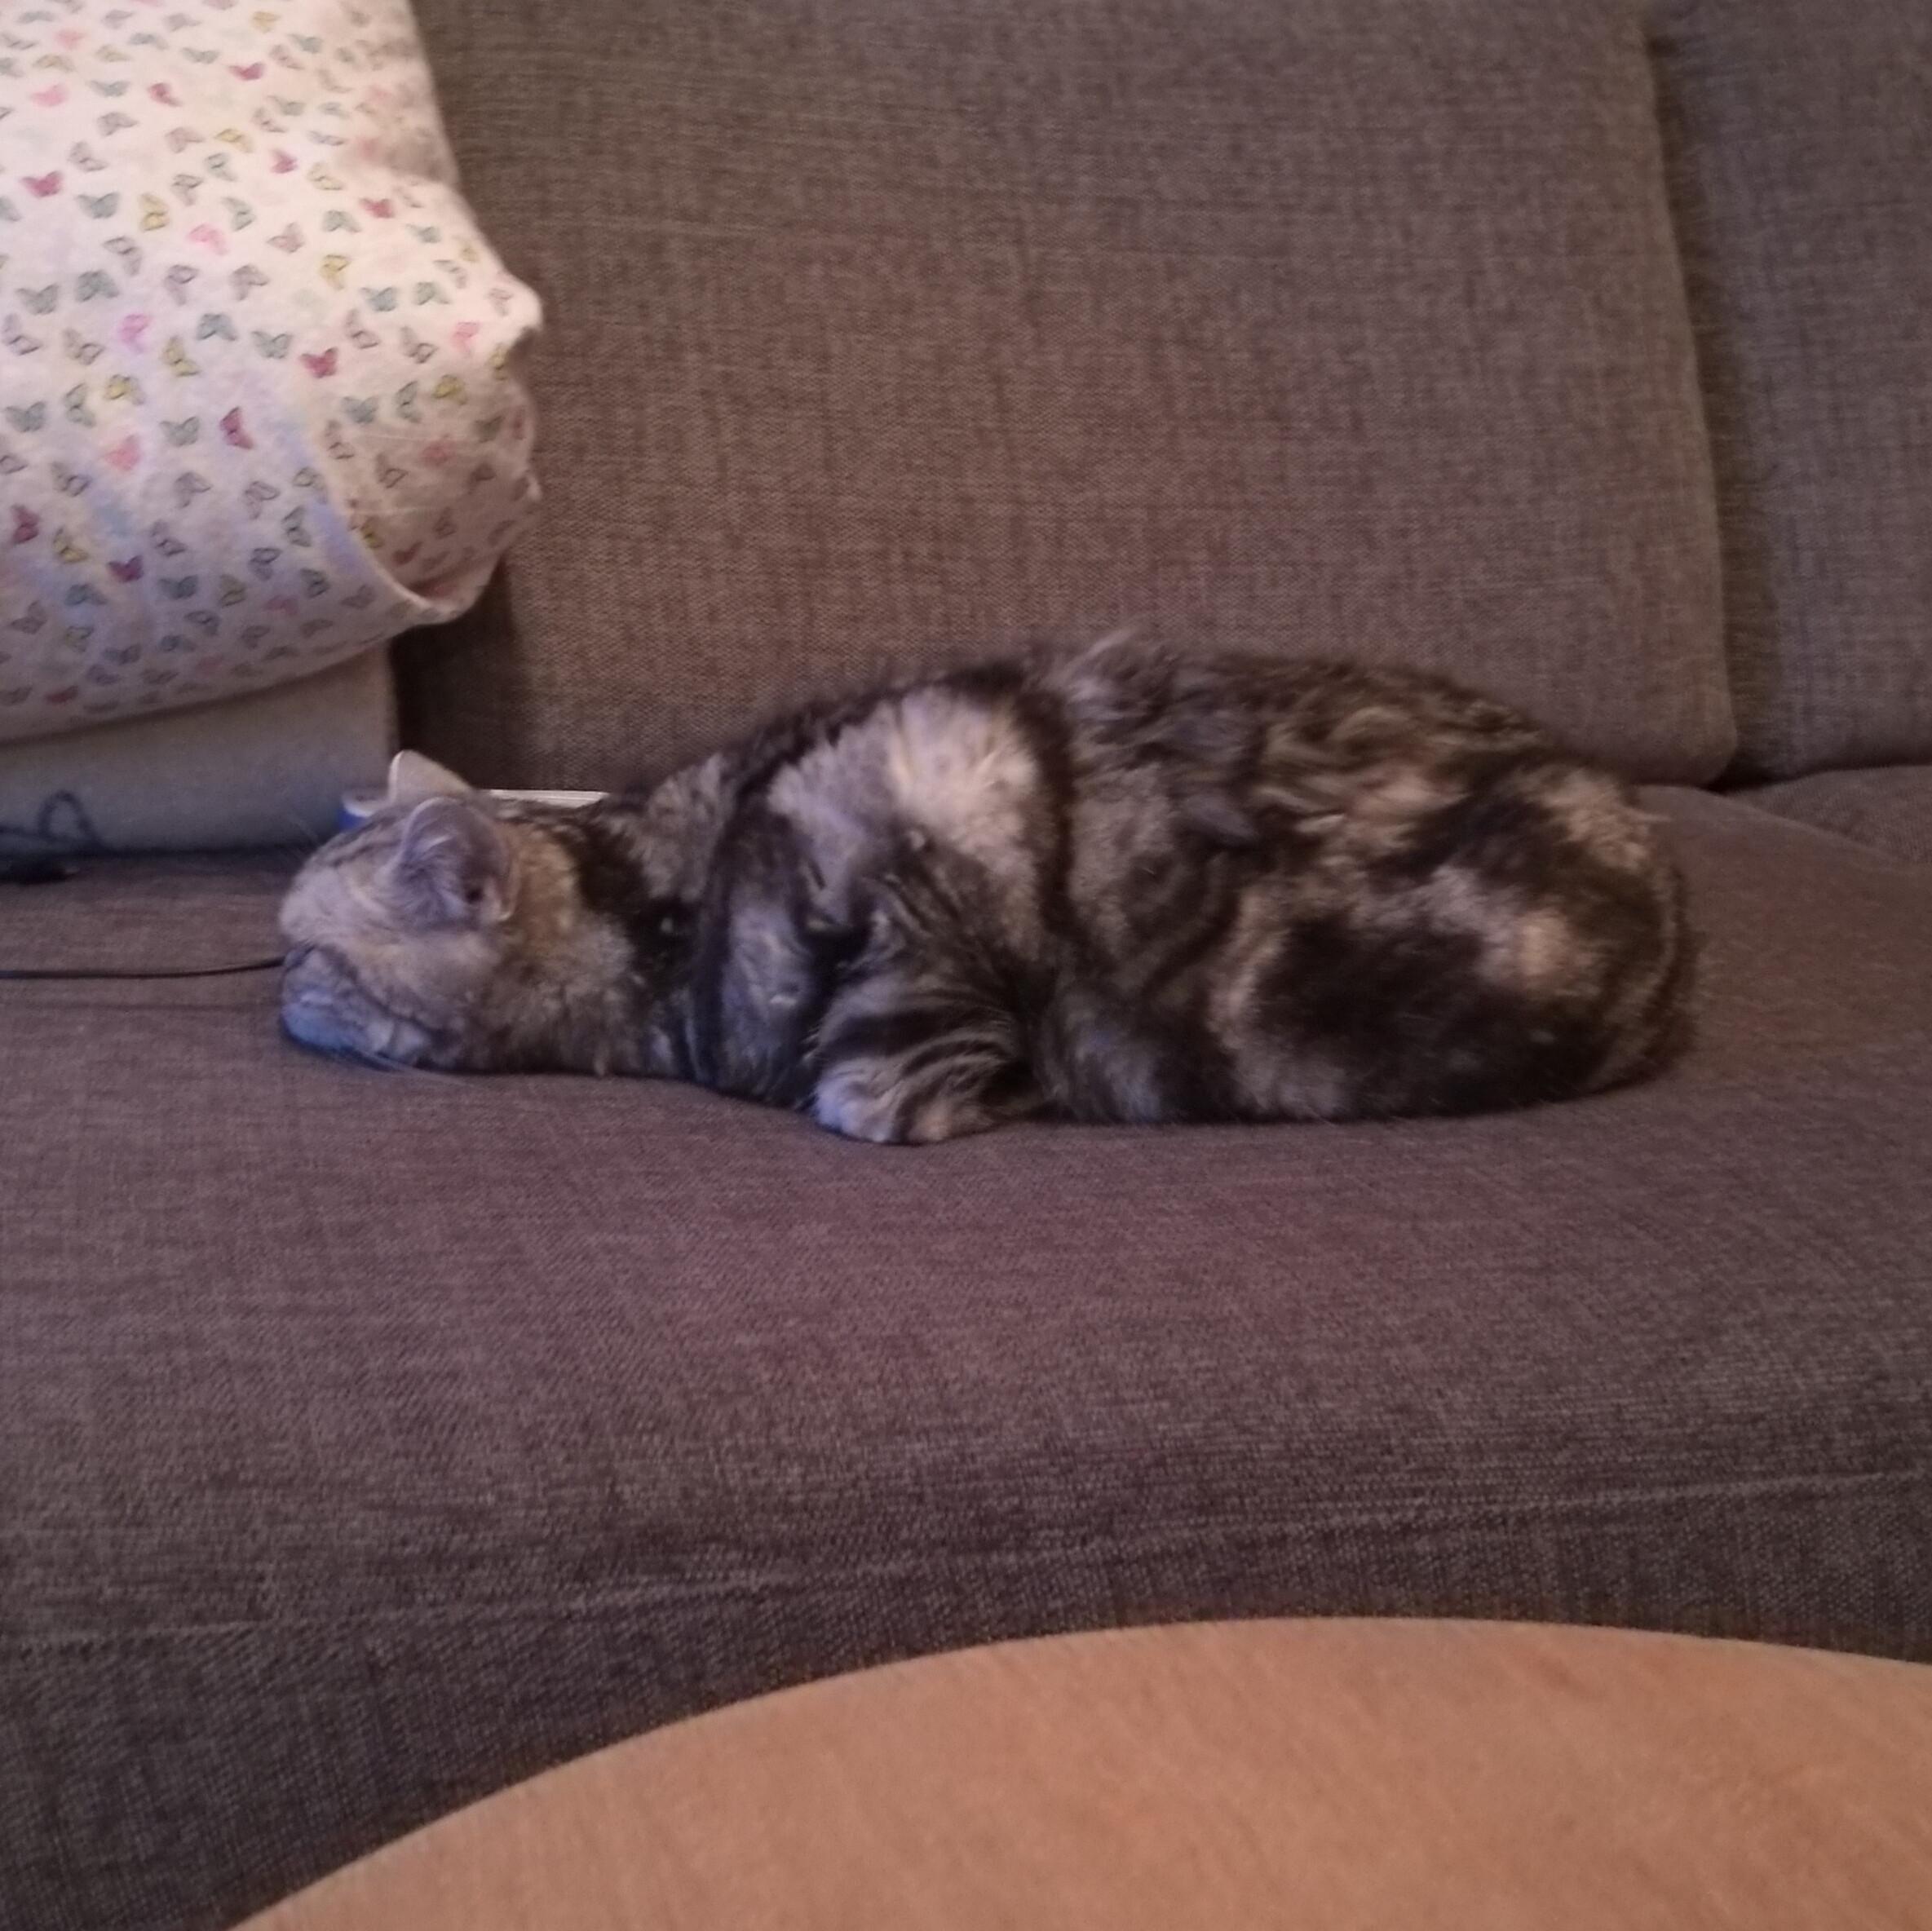 Meet Mussi, half cat, half AT-AT